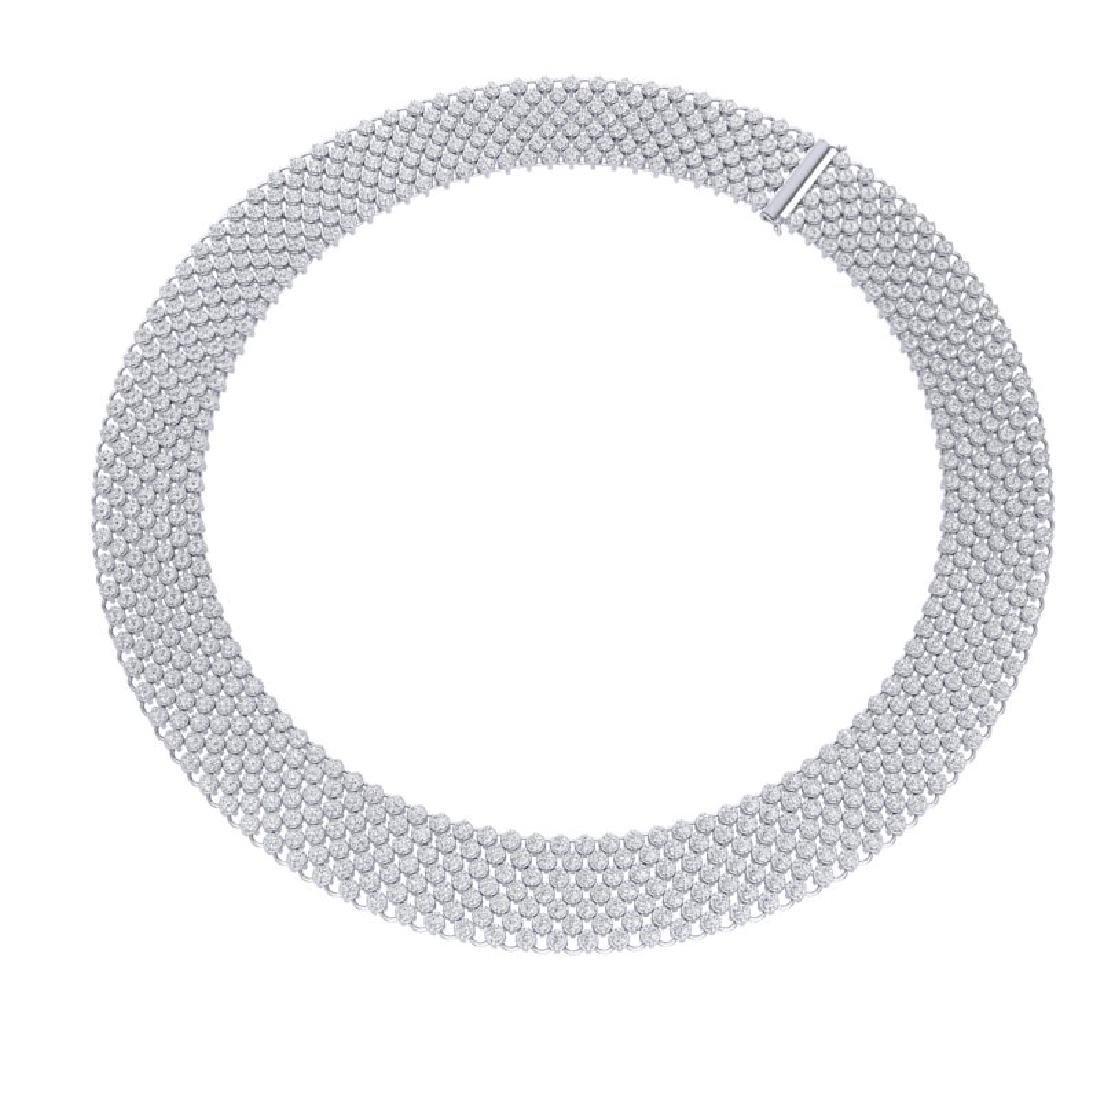 35 CTW Certified VS/SI Diamond Necklace 18K White Gold - 2